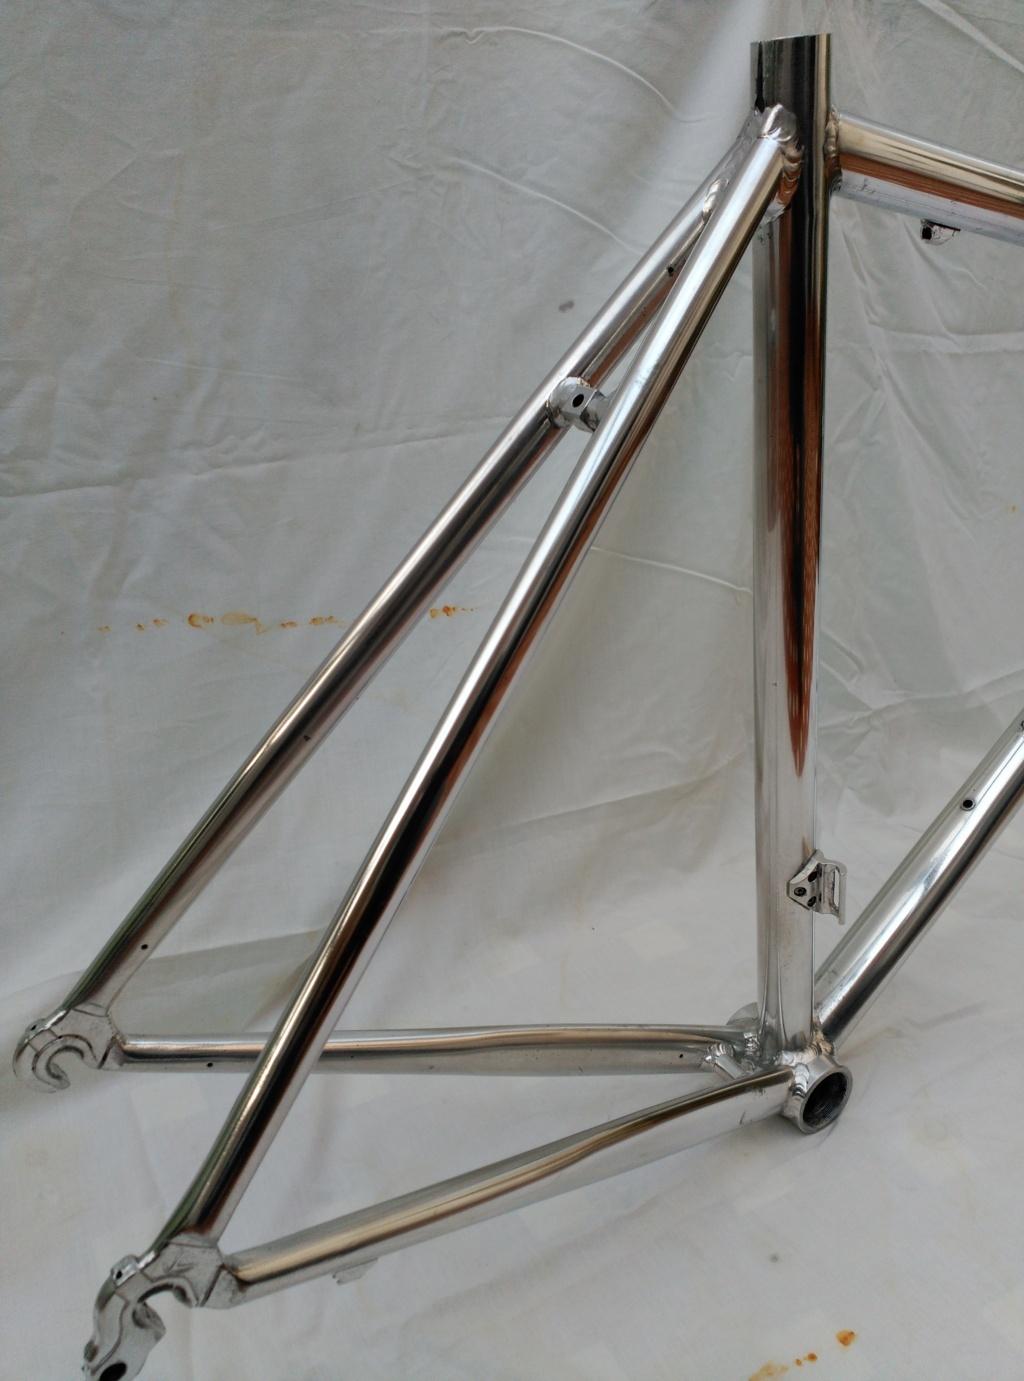 le vélo calme: Mendiz (III). Decapado cuadro de aluminio